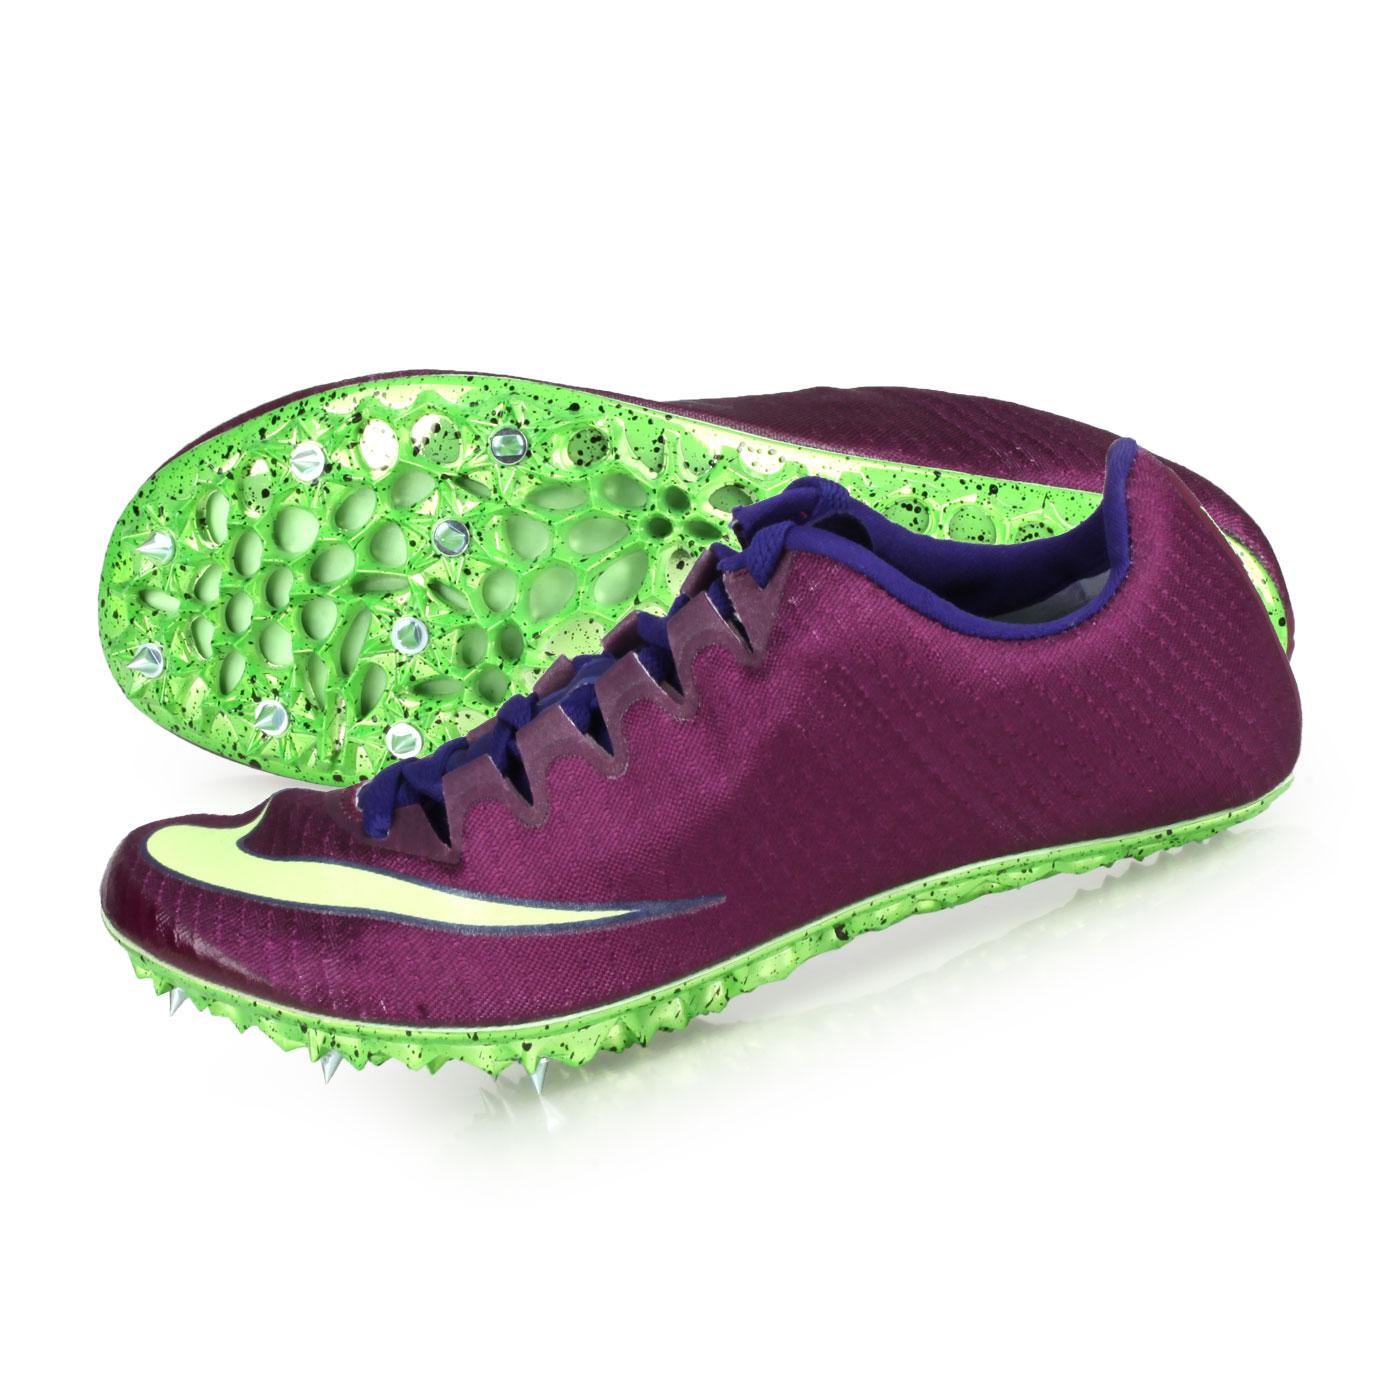 NIKE 田徑釘鞋(短距離)  @ZOOM SUPERFLY ELITE@835996001 - 深紫螢光綠